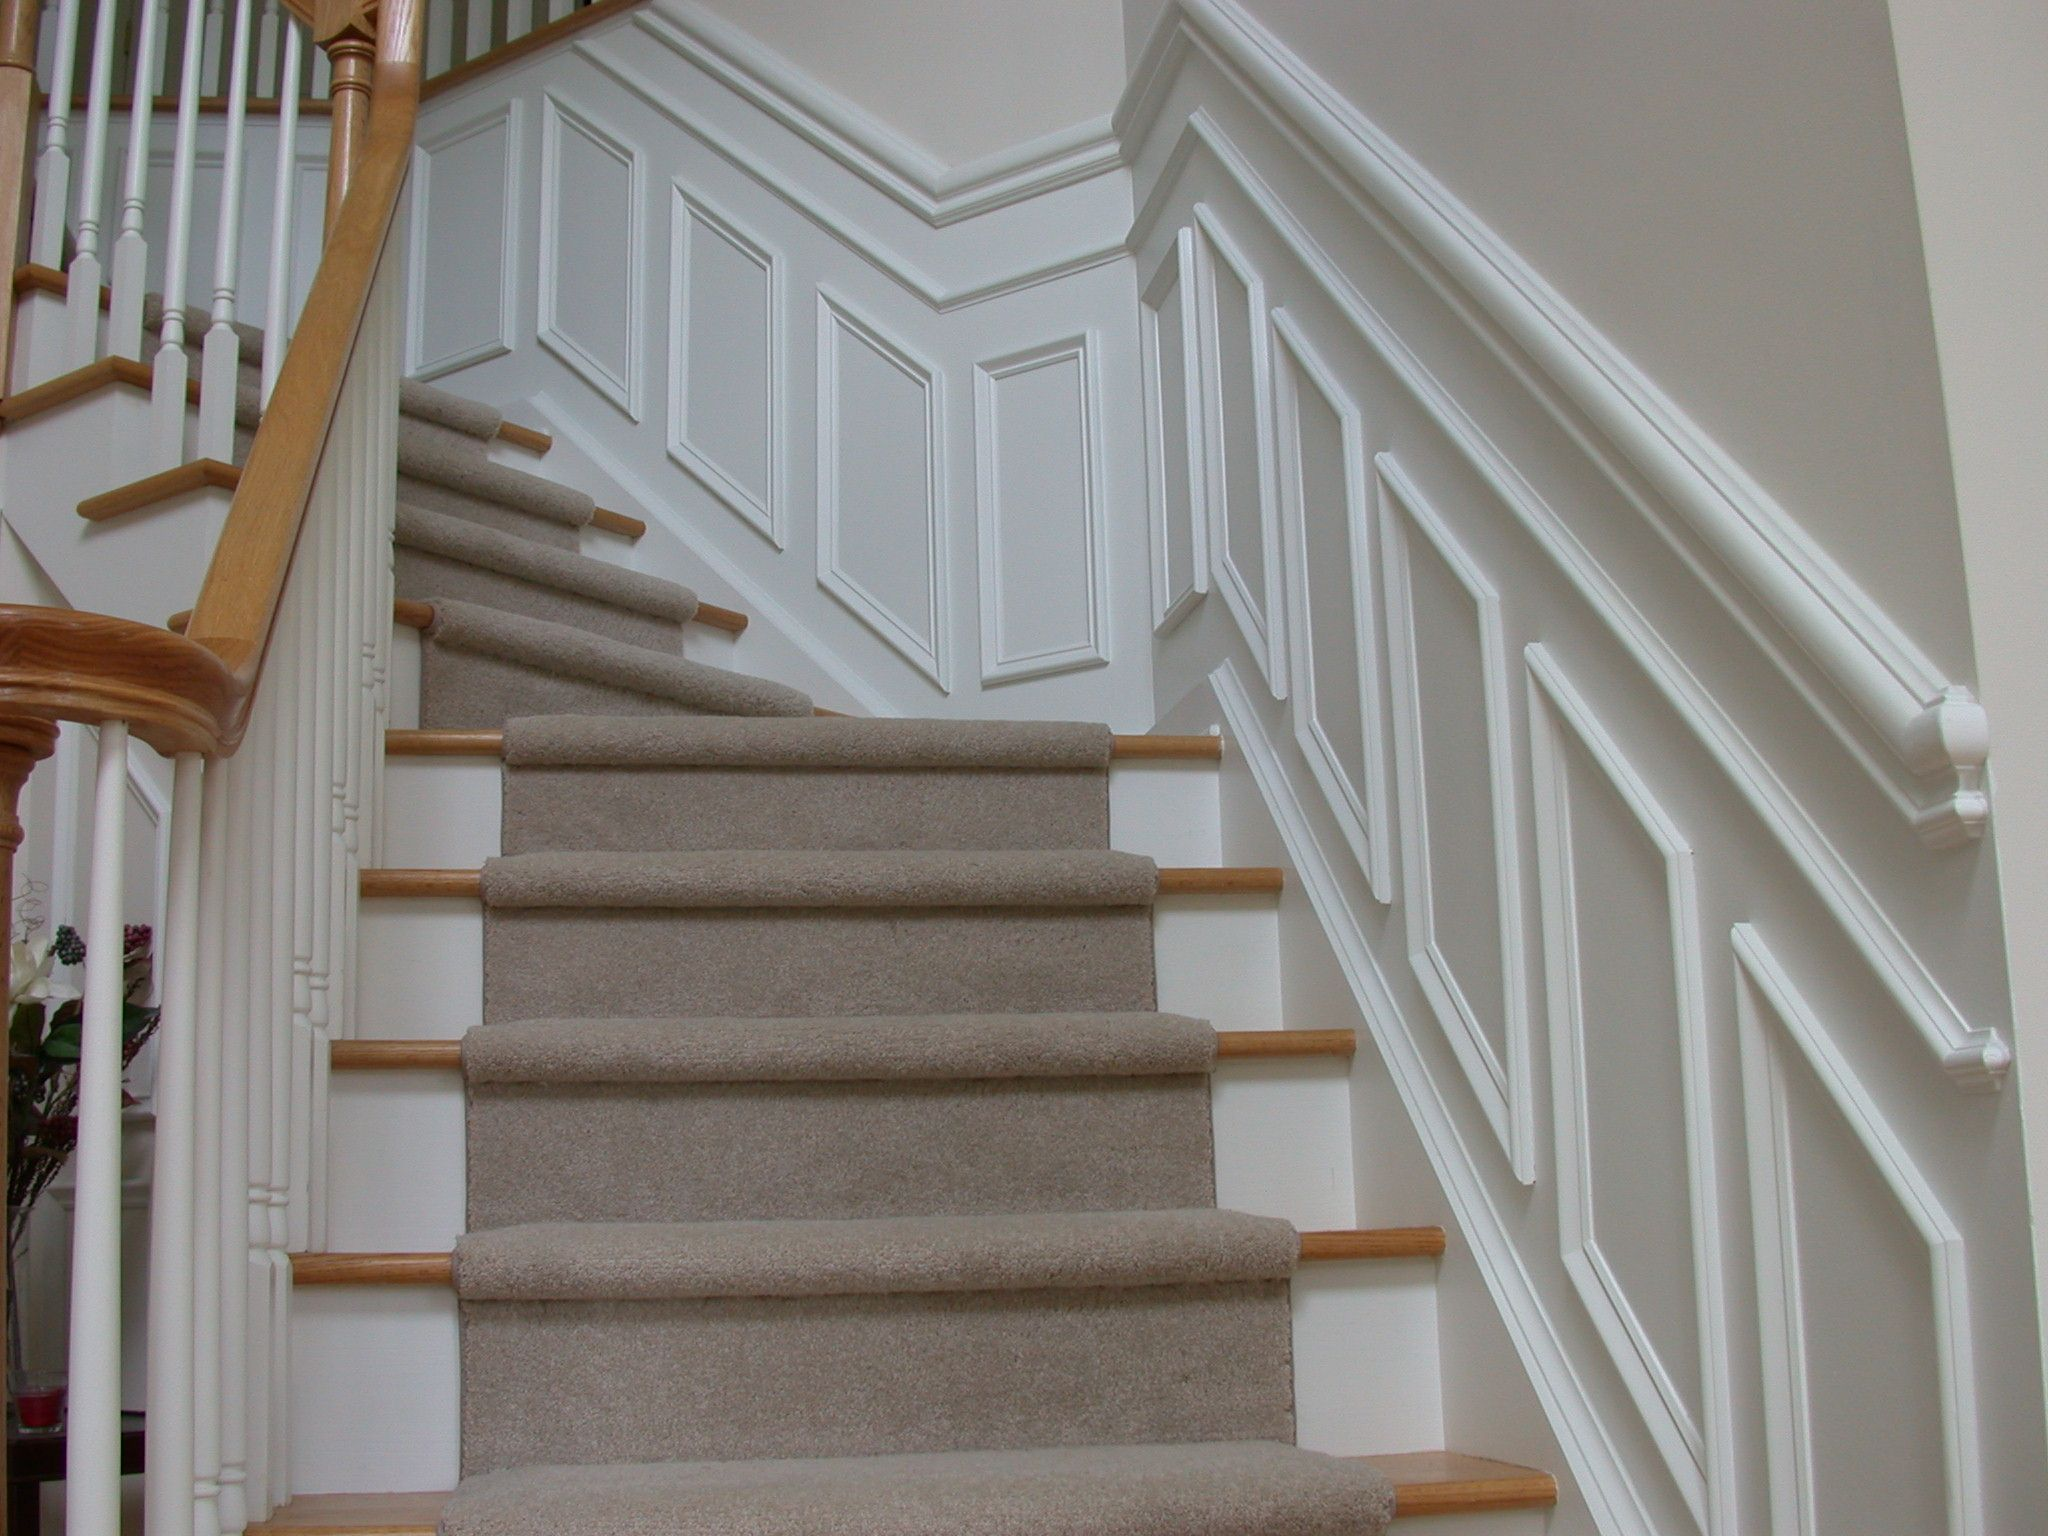 trex trim | Trim & Molding Ideas « Dream Builders & Remodeling ...